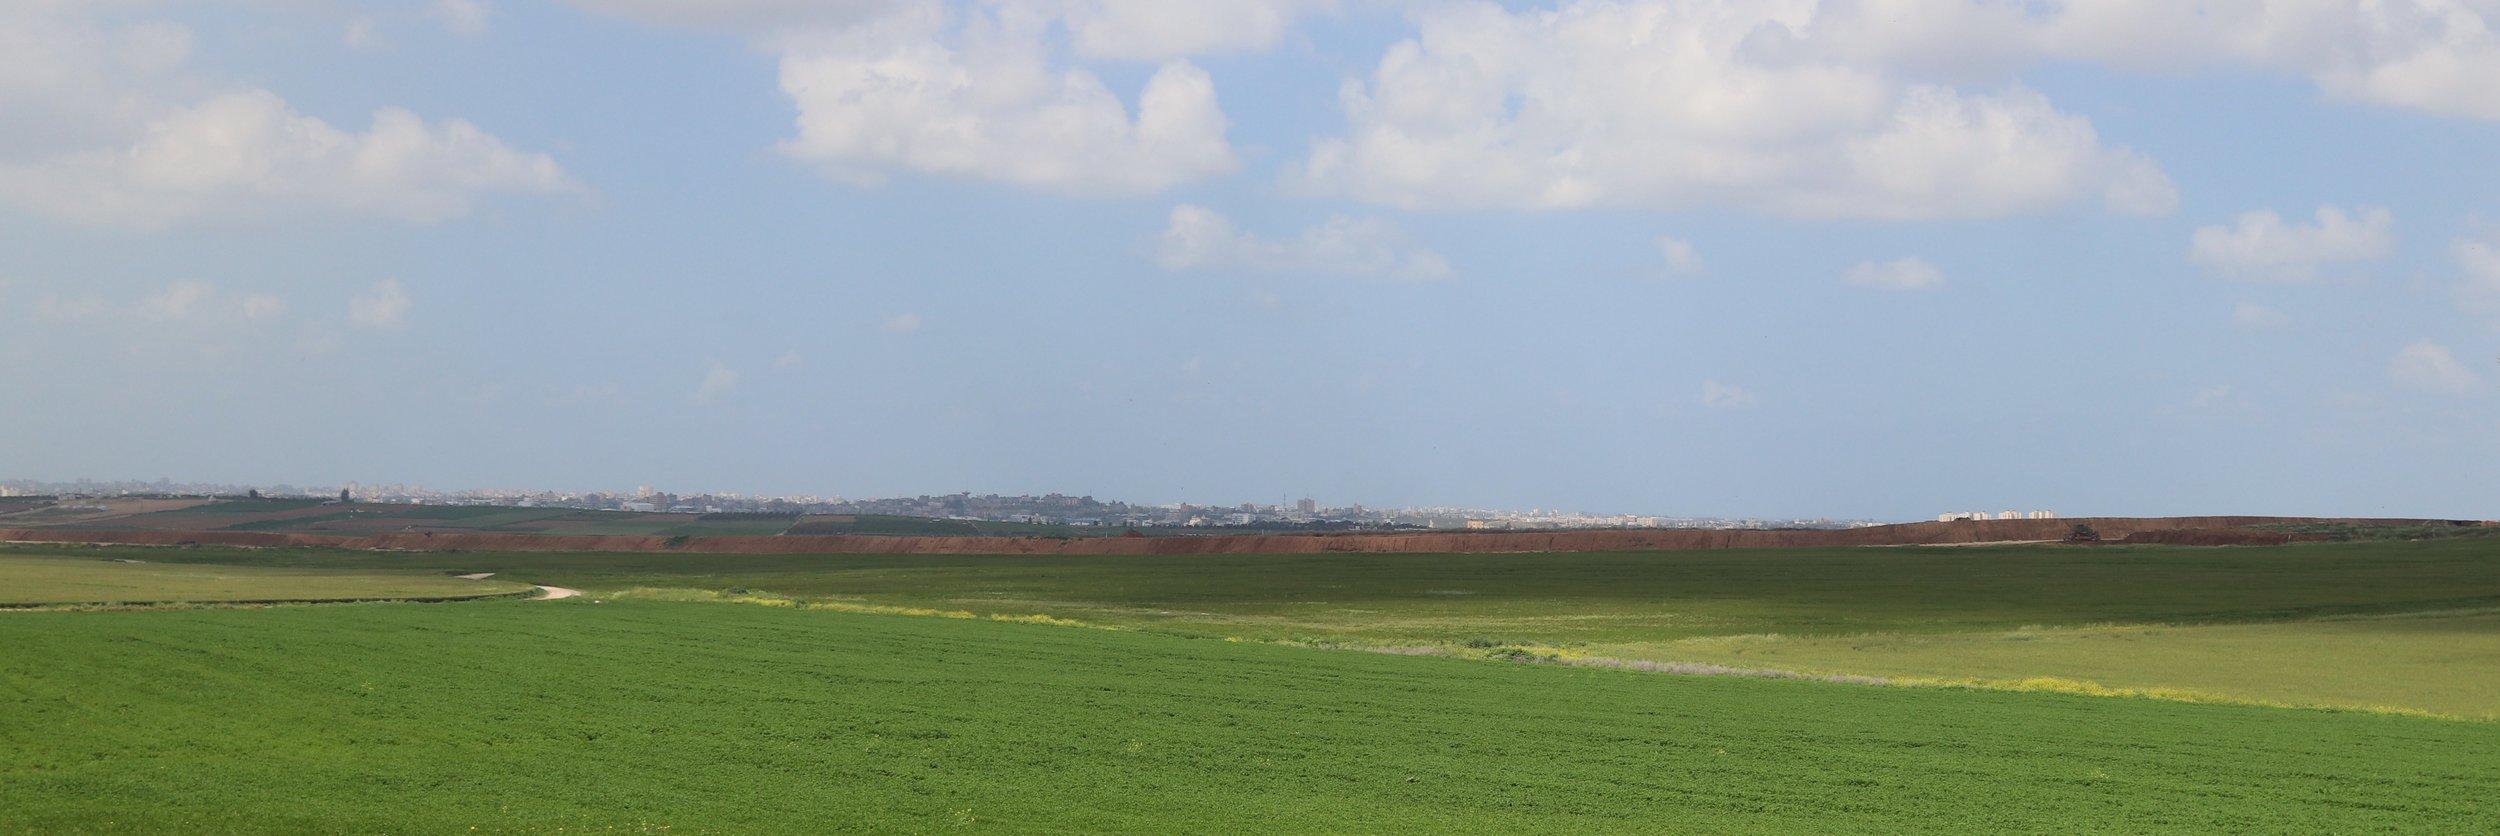 Looking across the open farmland from Israel toward Gaza.